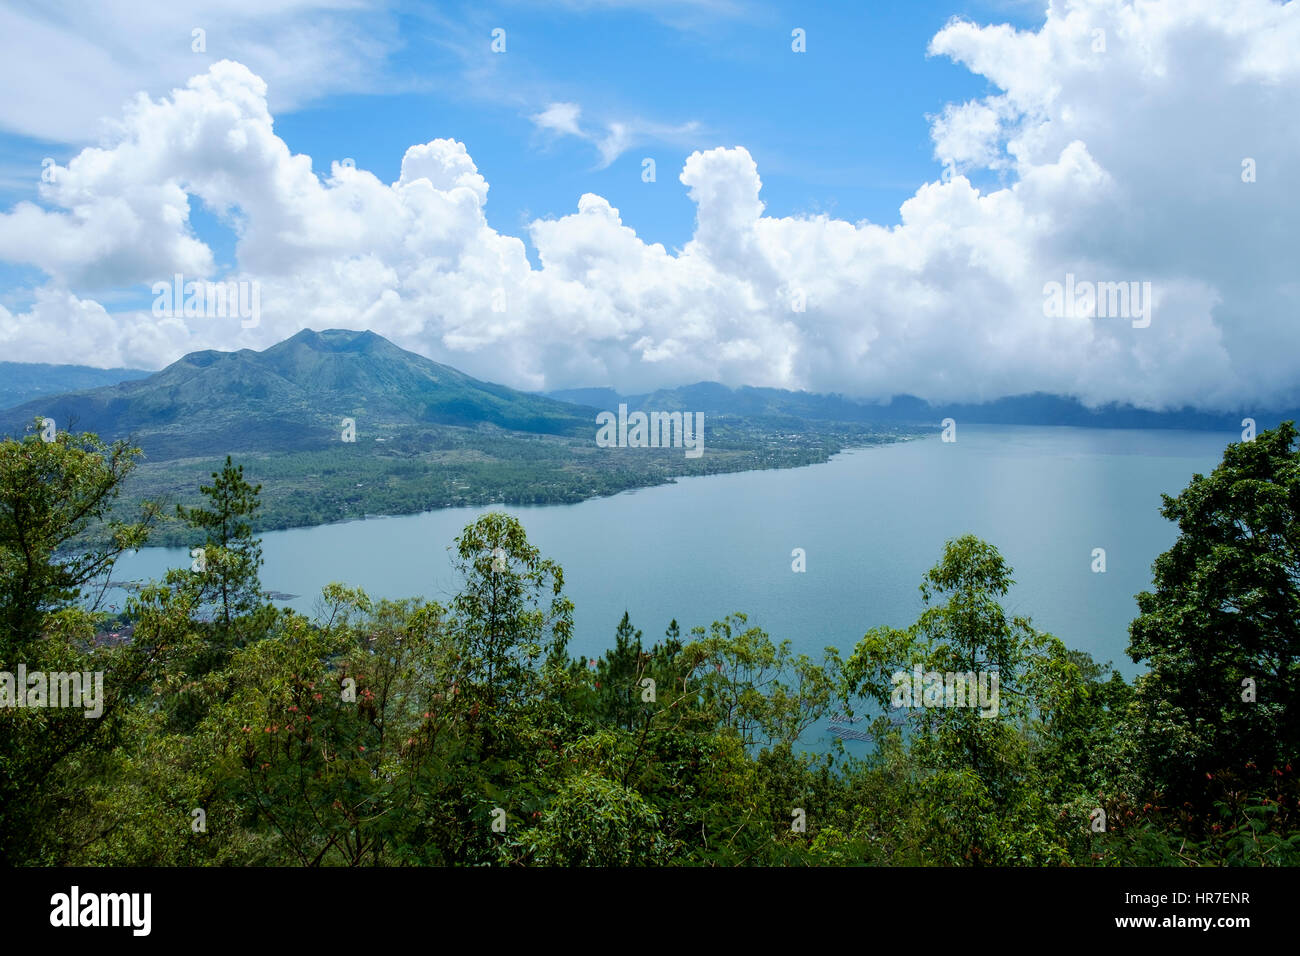 Lake Batur and Mount Batur (Gunung Batur), an active stratovolcano, seen from the Penelokan, KIntamani, Bali, Indonesia. - Stock Image